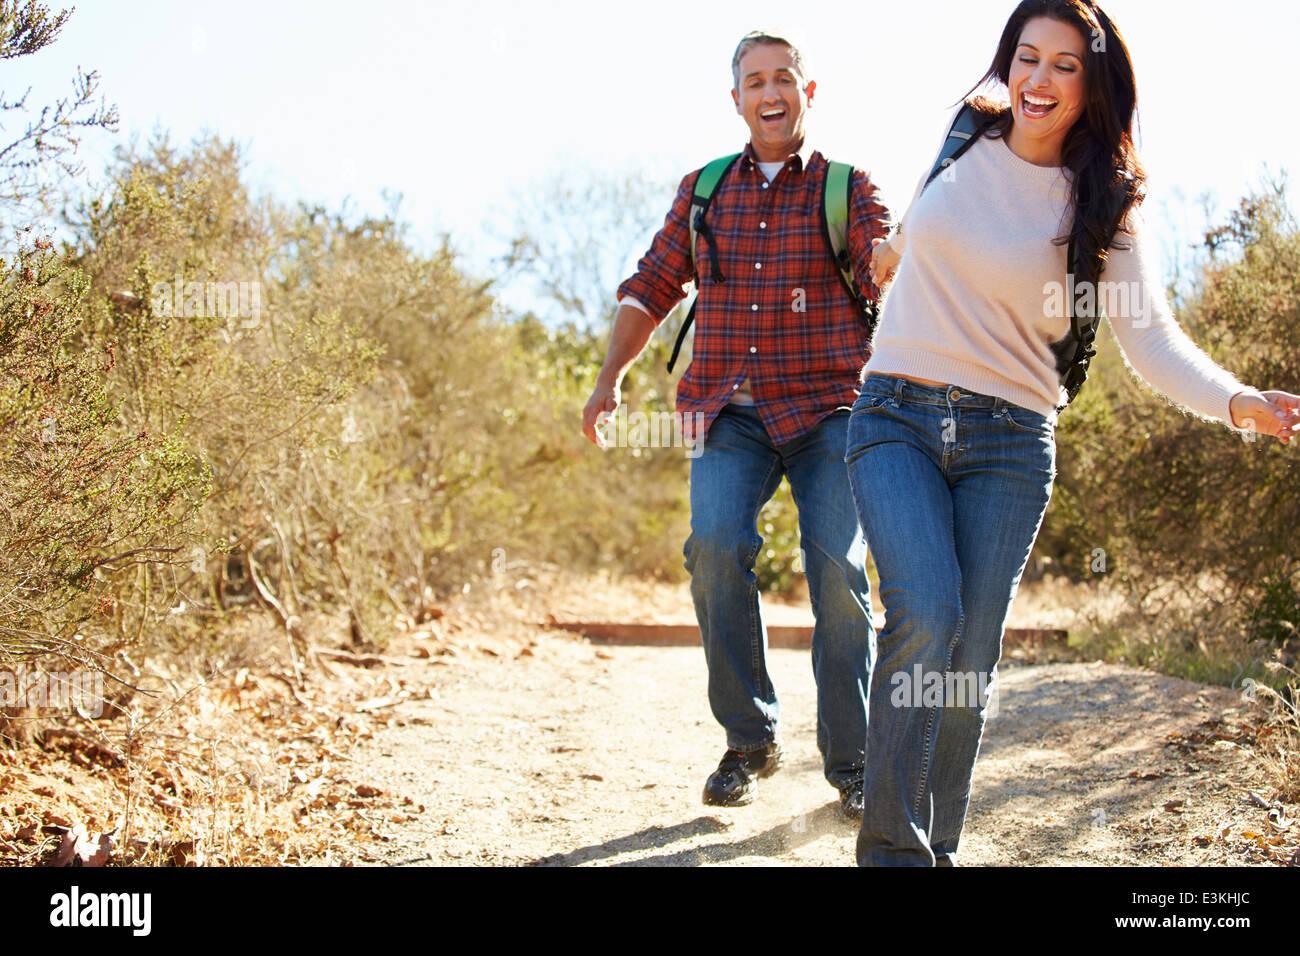 Paar In Landschaft tragen Rucksäcke Wandern Stockbild